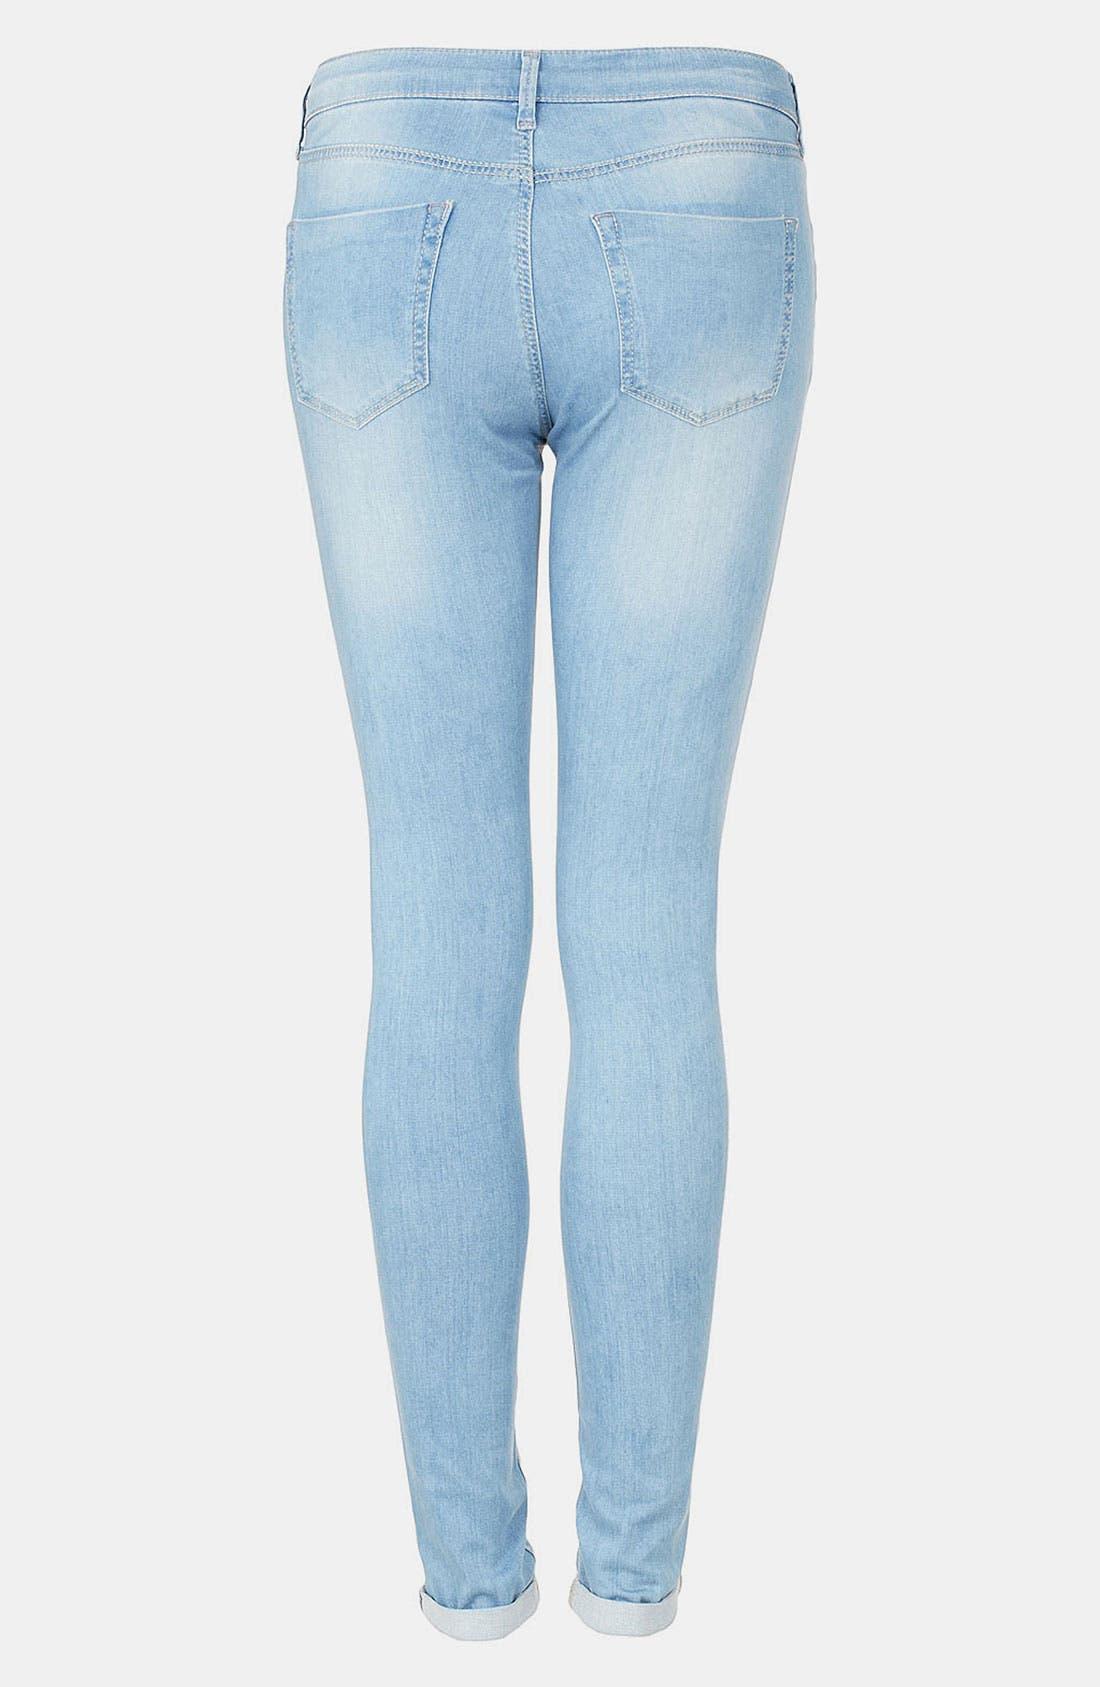 Alternate Image 2  - Topshop Moto 'Leigh' Bleach Wash Skinny Jeans (Long)